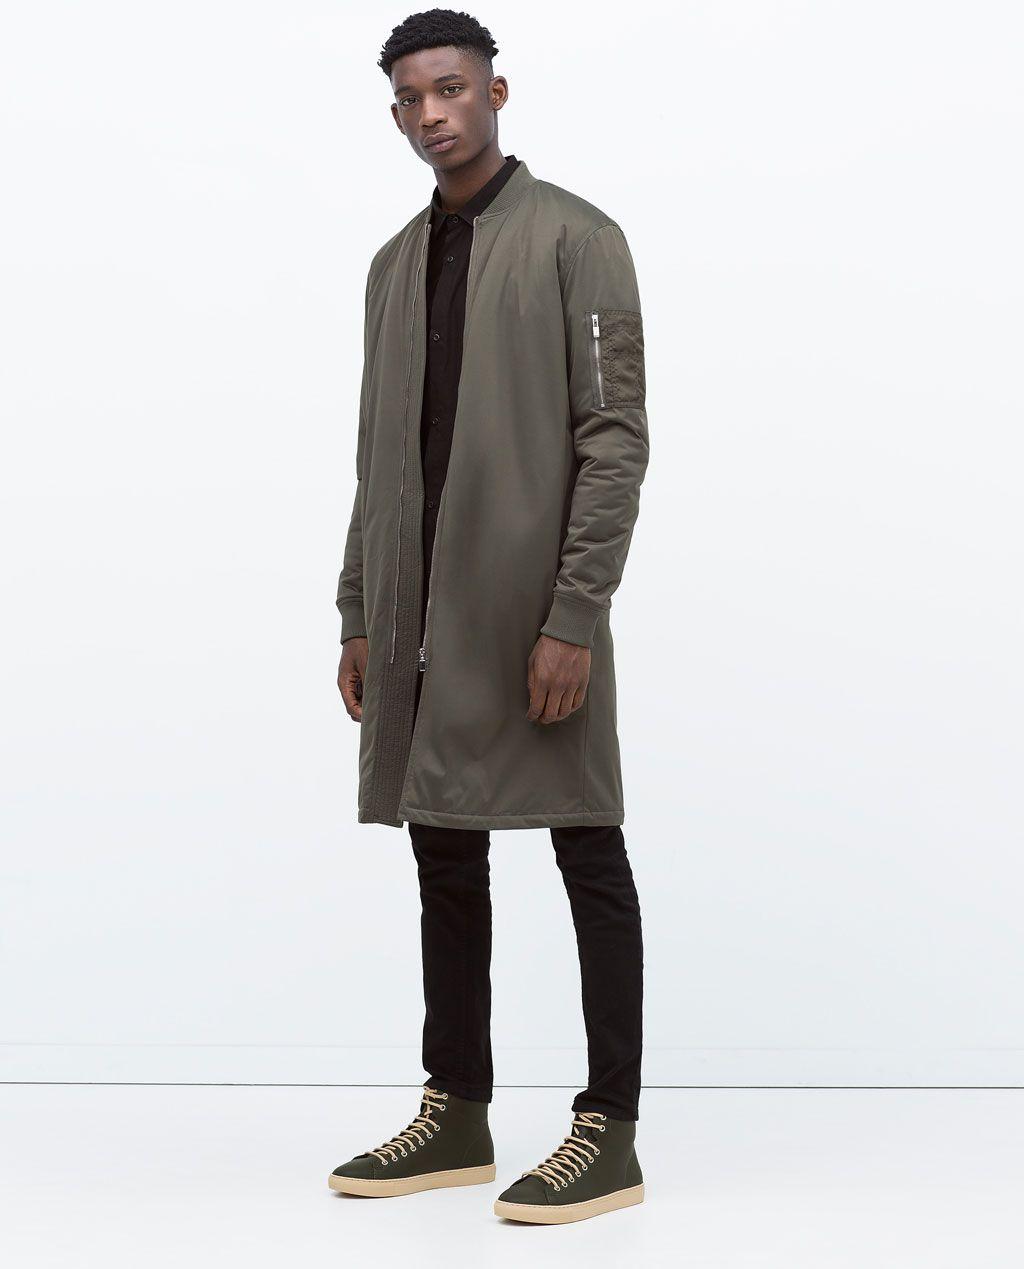 Zara Collection Aw15 Aviator Style Long Jacket Herren Mantel Street Styles Fur Herren Bomberjacke Manner